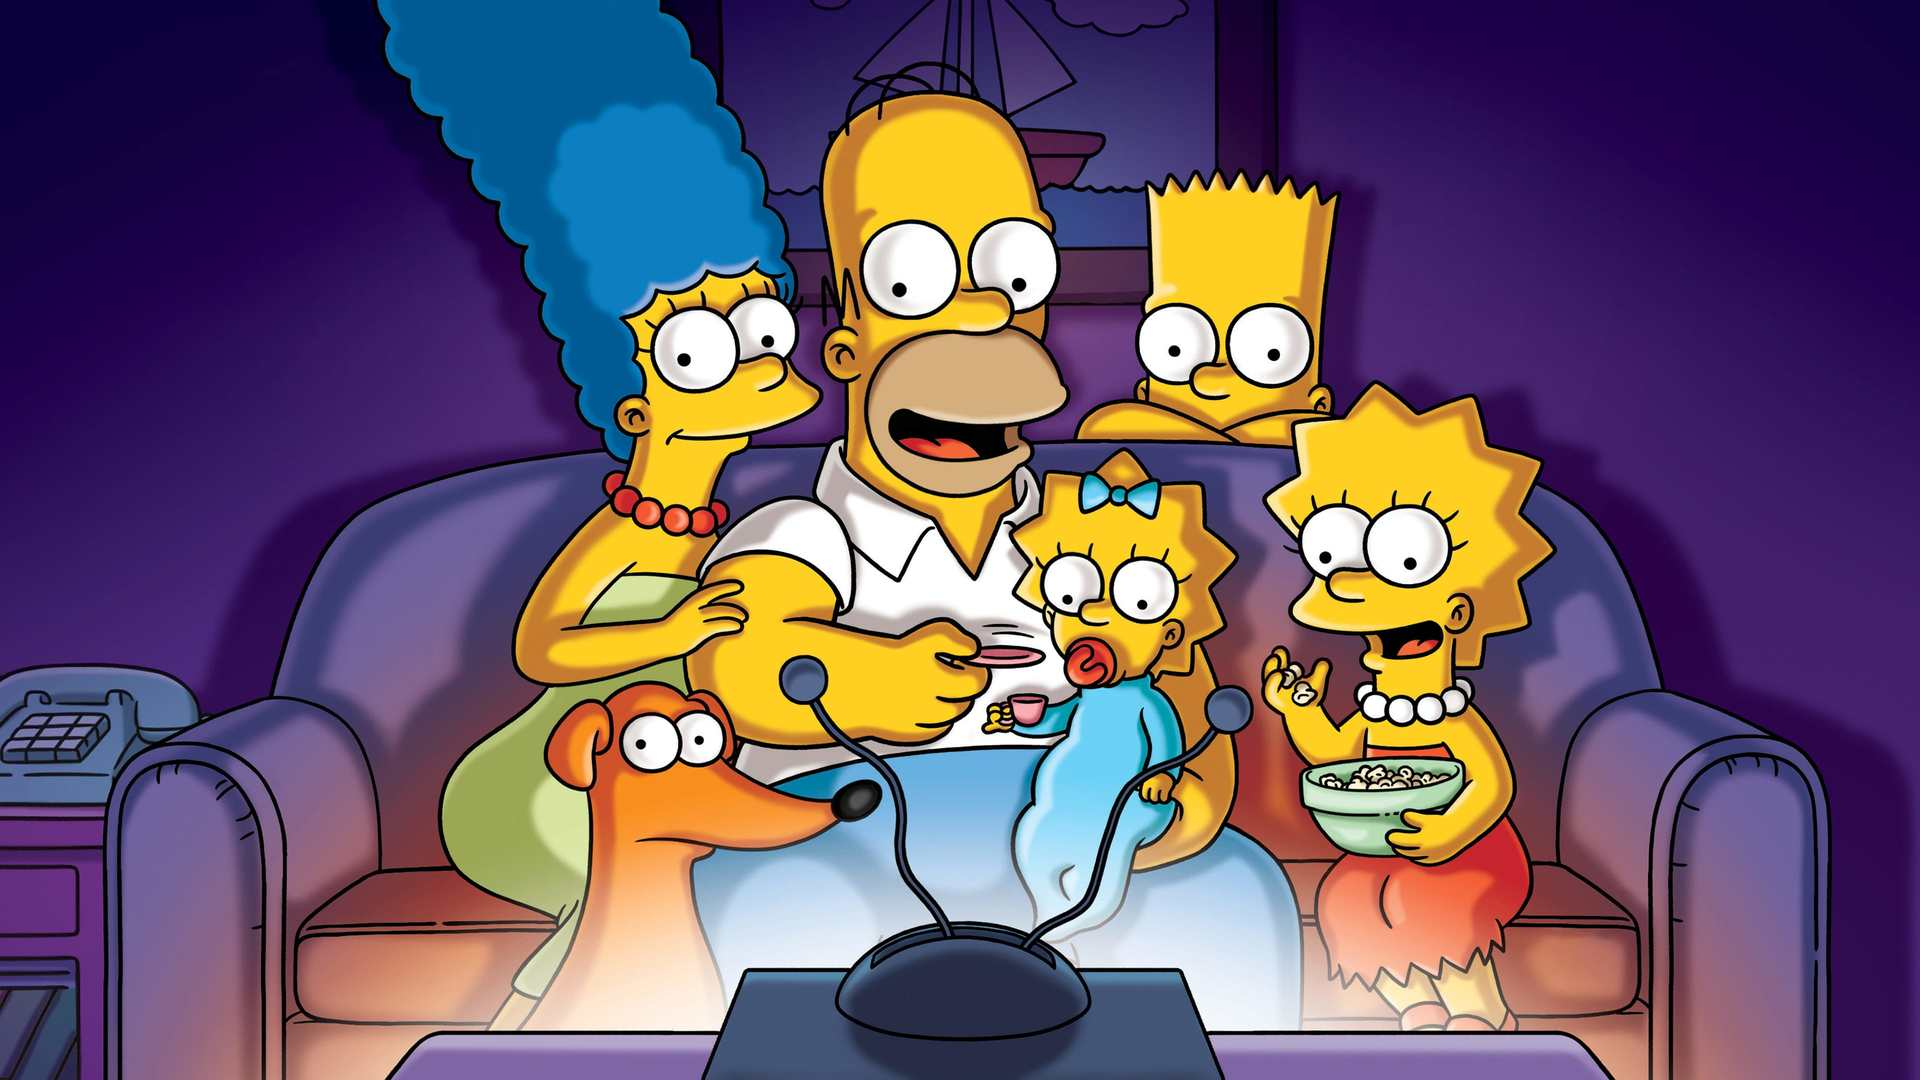 Кадры из фильма Симпсоны The Simpsons 1989